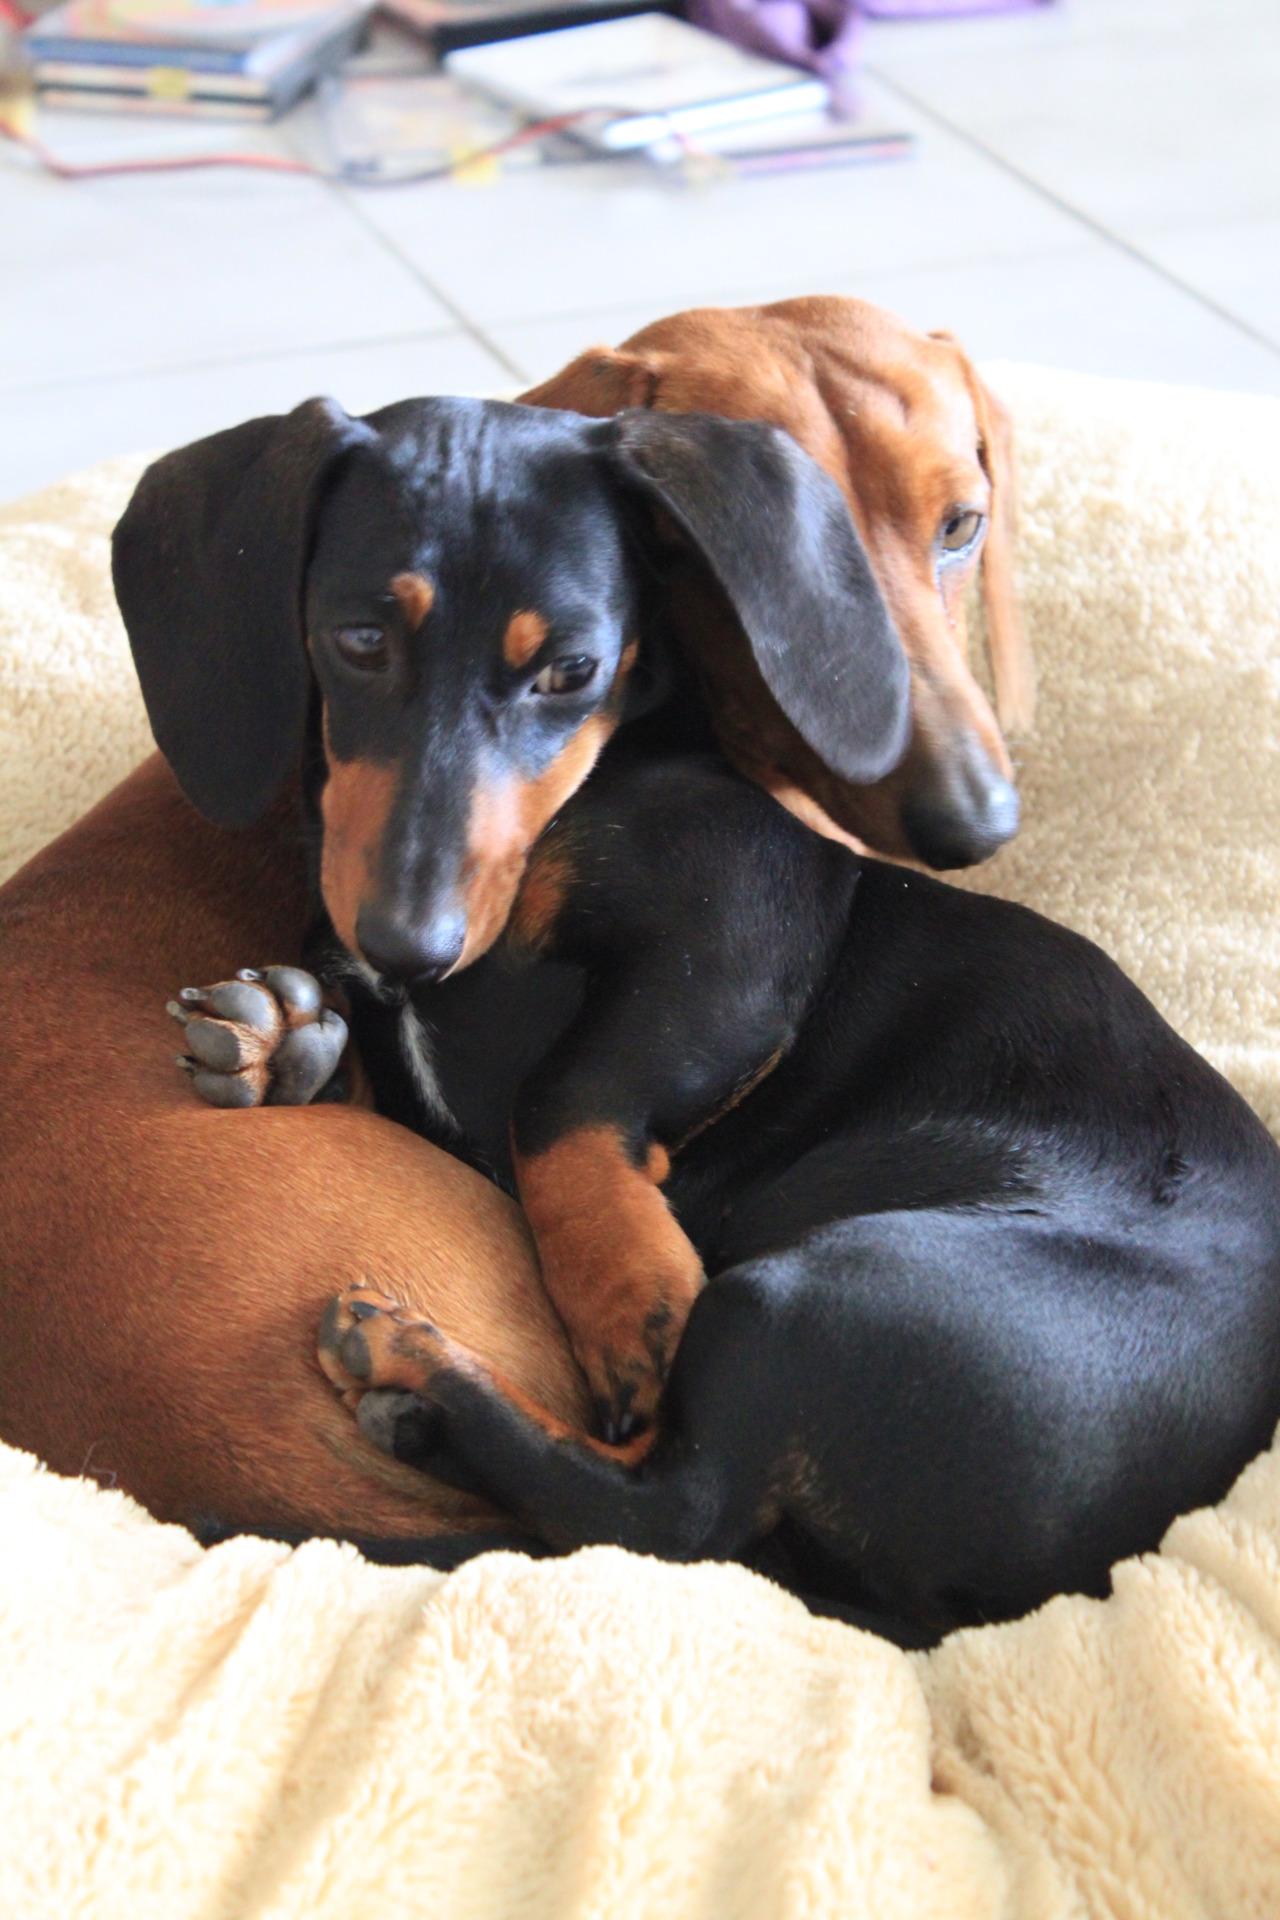 I Love Dachshunds Dachshund love | PinPo...